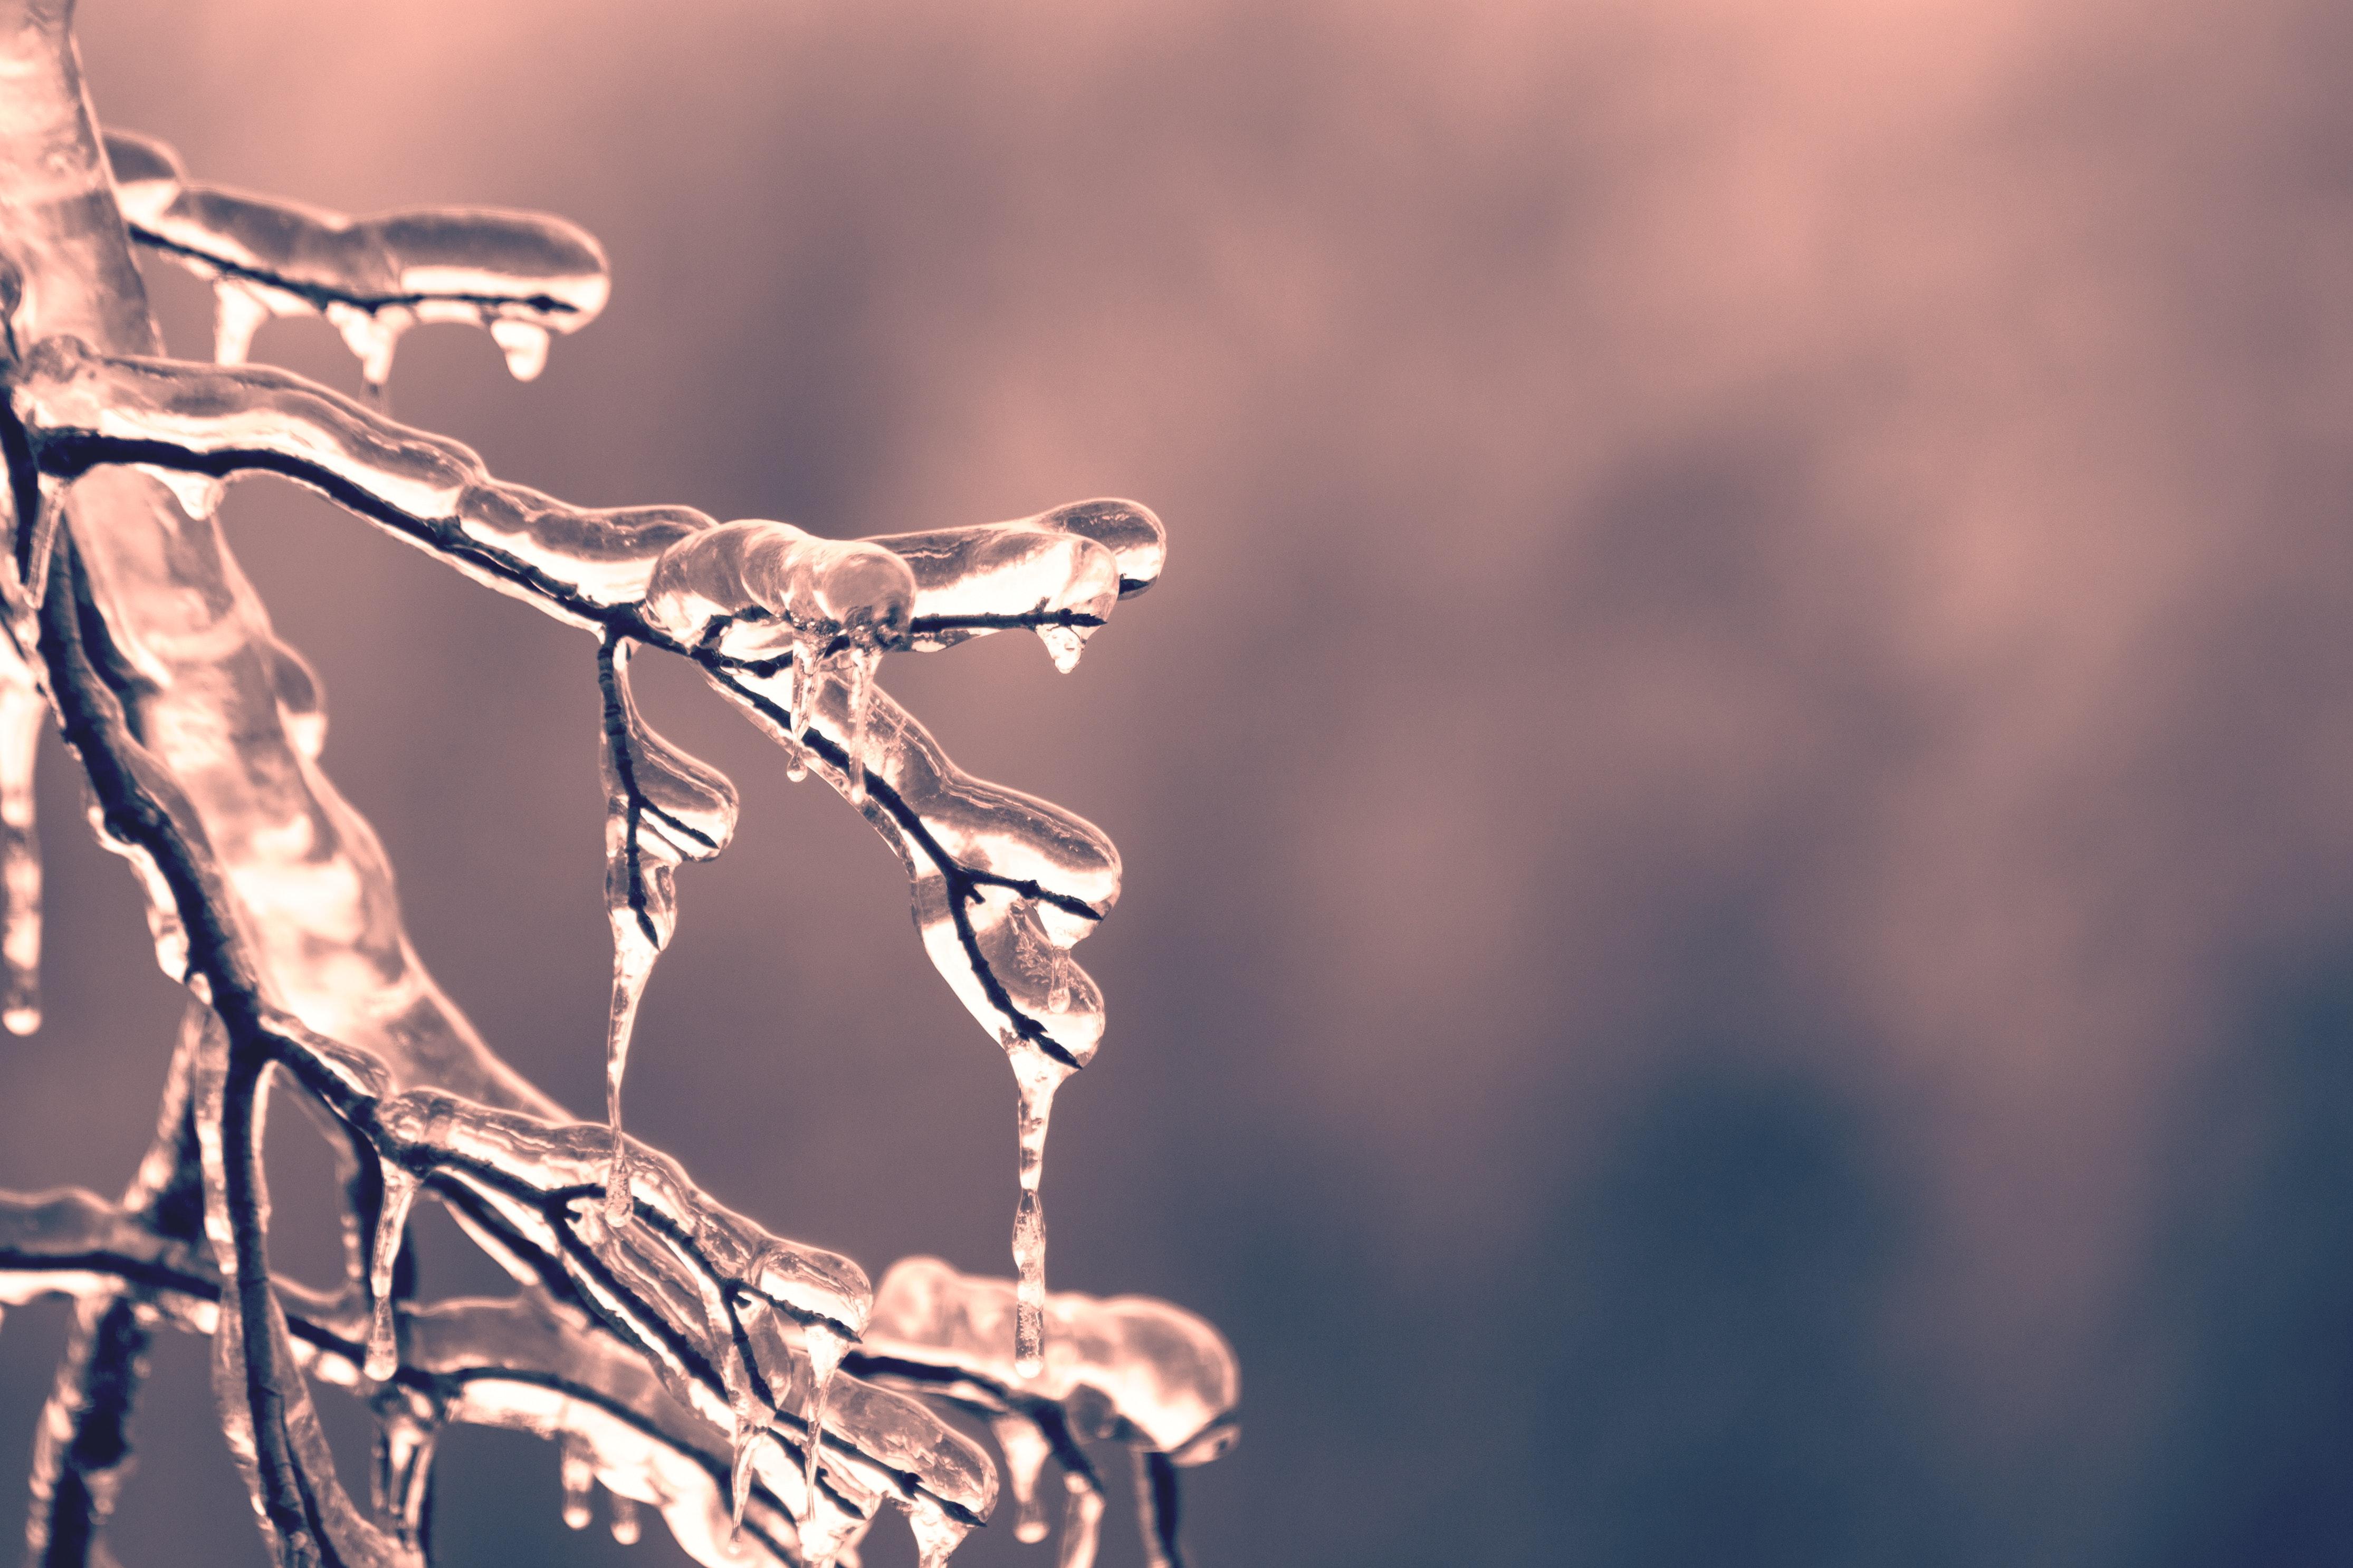 blur-branch-close-up-436792